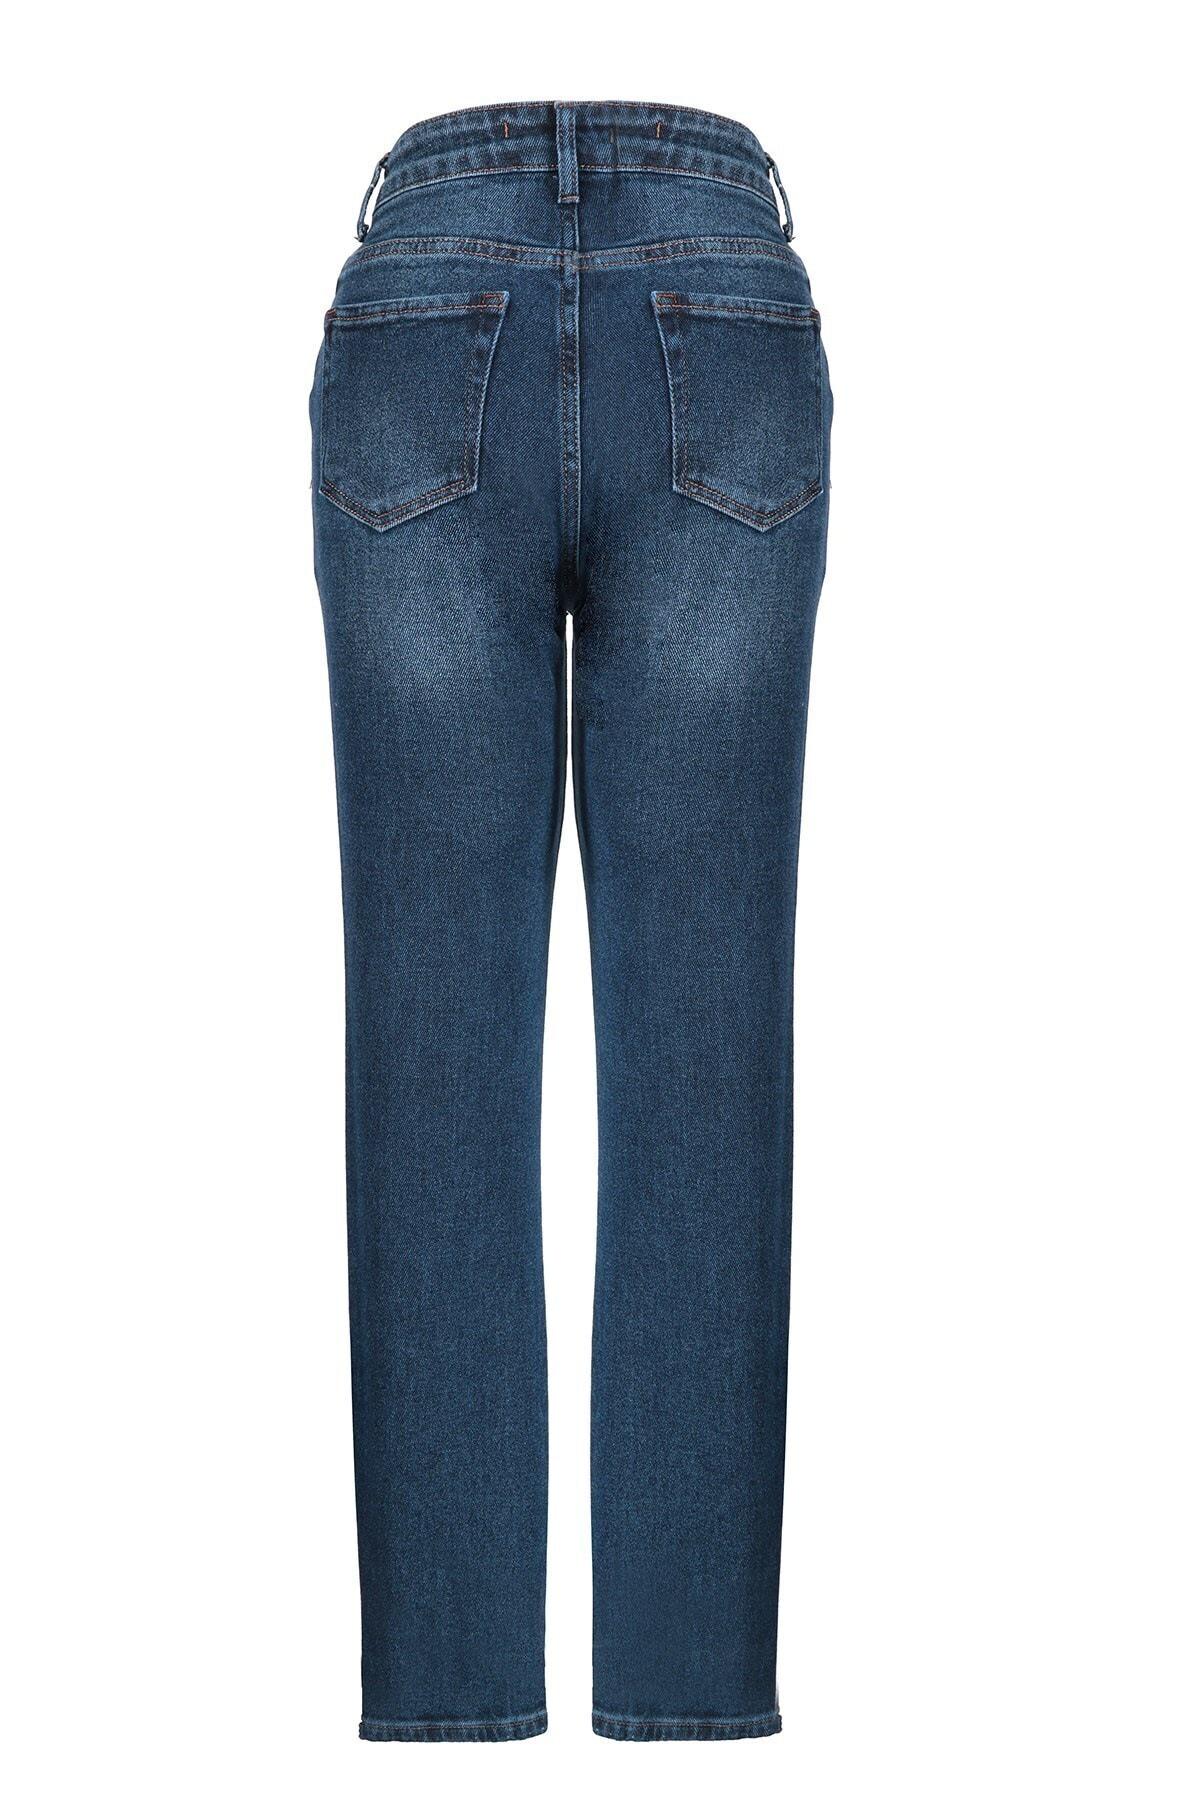 Oblavion Kadın Mavi Mom Jeans 2